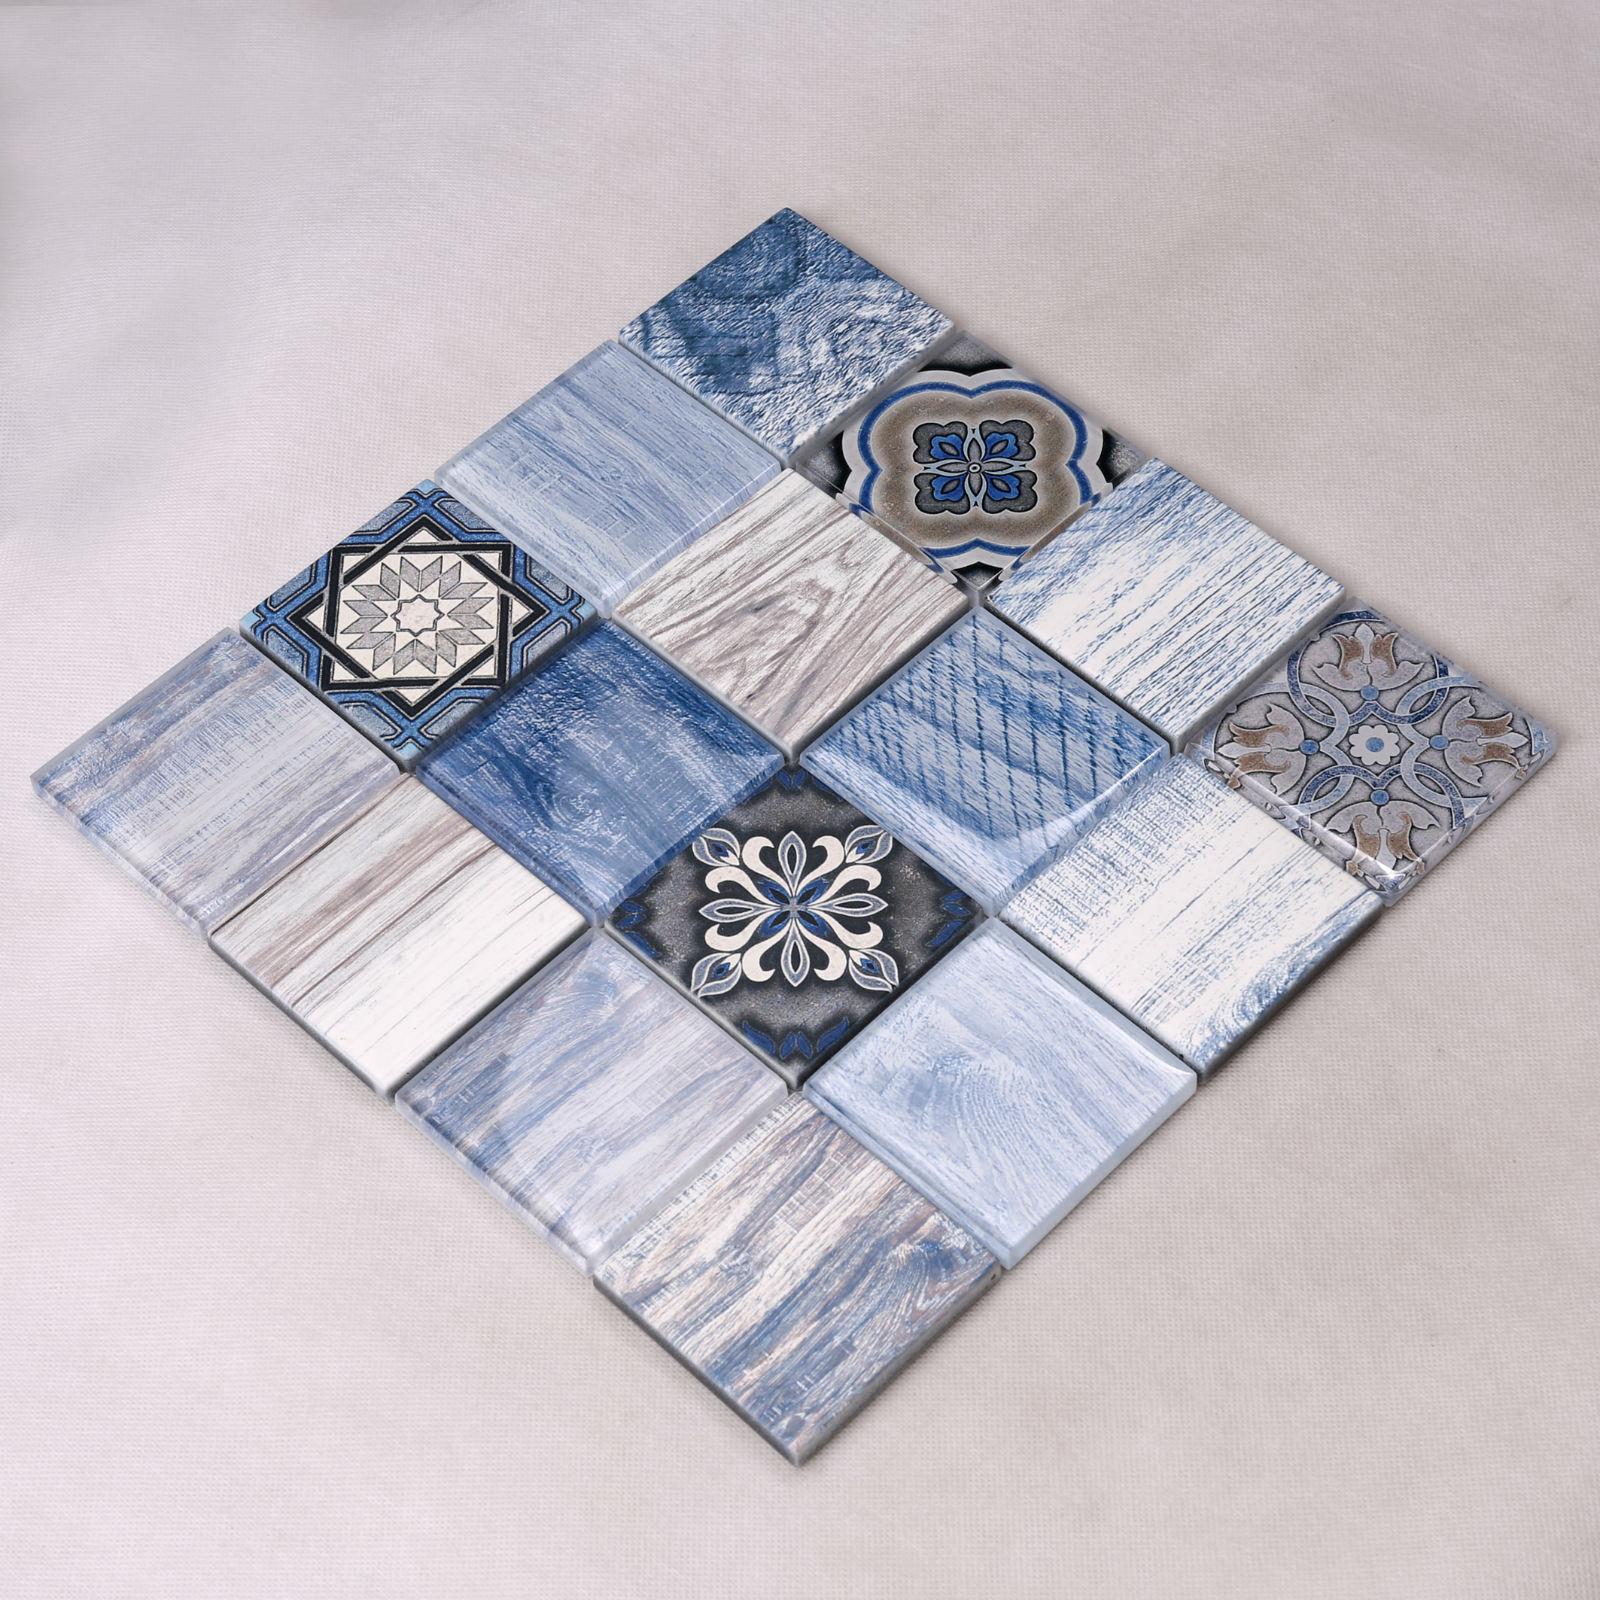 Heng Xing-Oem Green Glass Tile Manufacturer, Glass Metal Mix Mosaic Tiles | Heng Xing